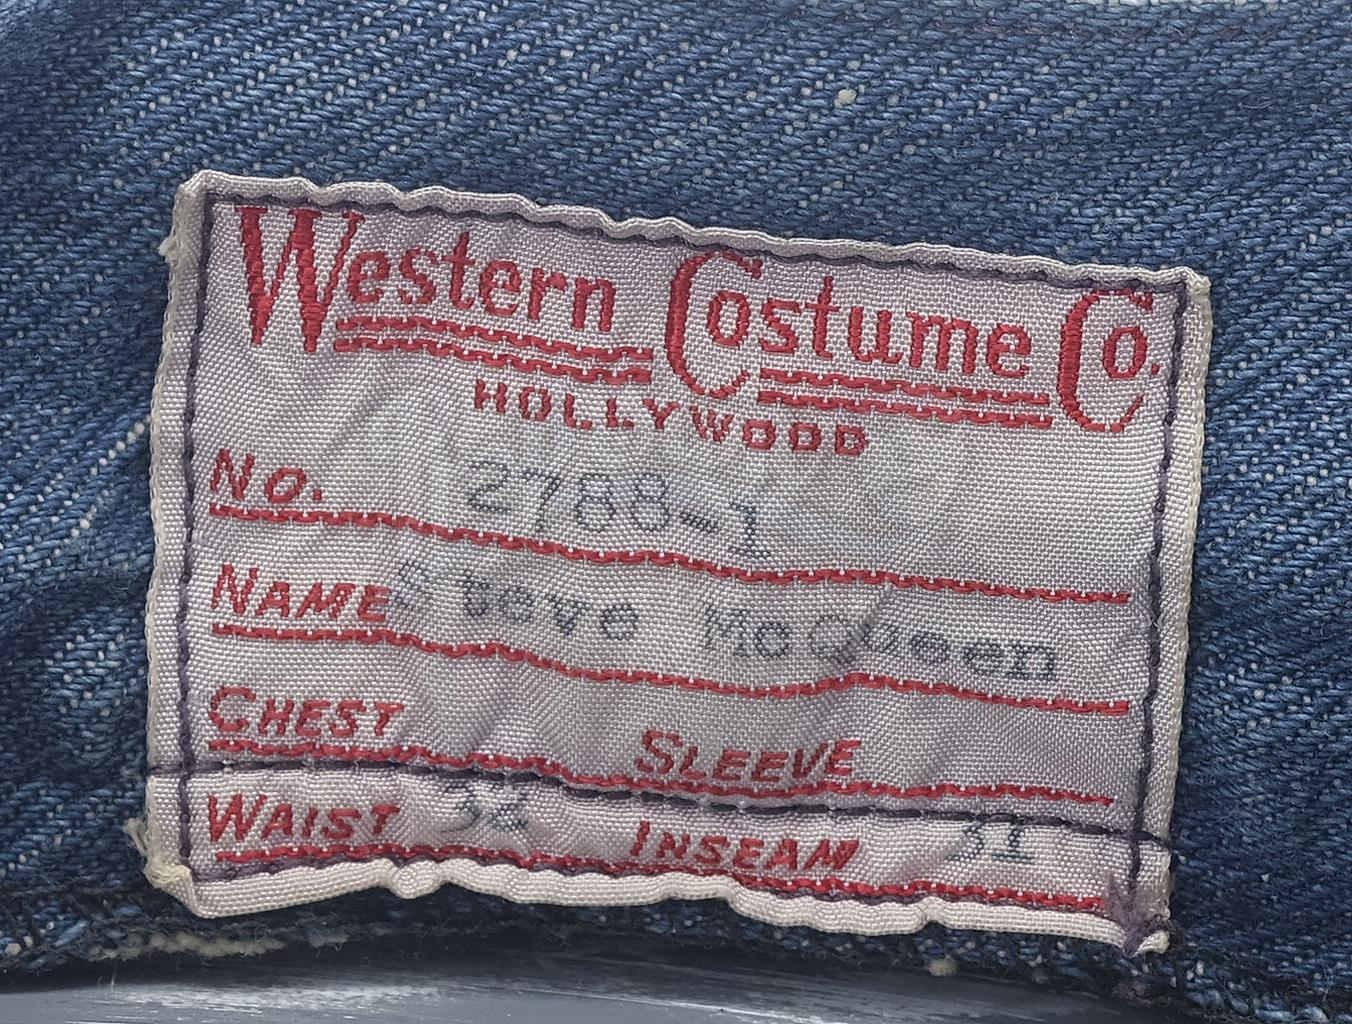 Lot # 1005: THE SAND PEBBLES - Jake Holman's (Steve McQueen) Jeans - Image 7 of 11